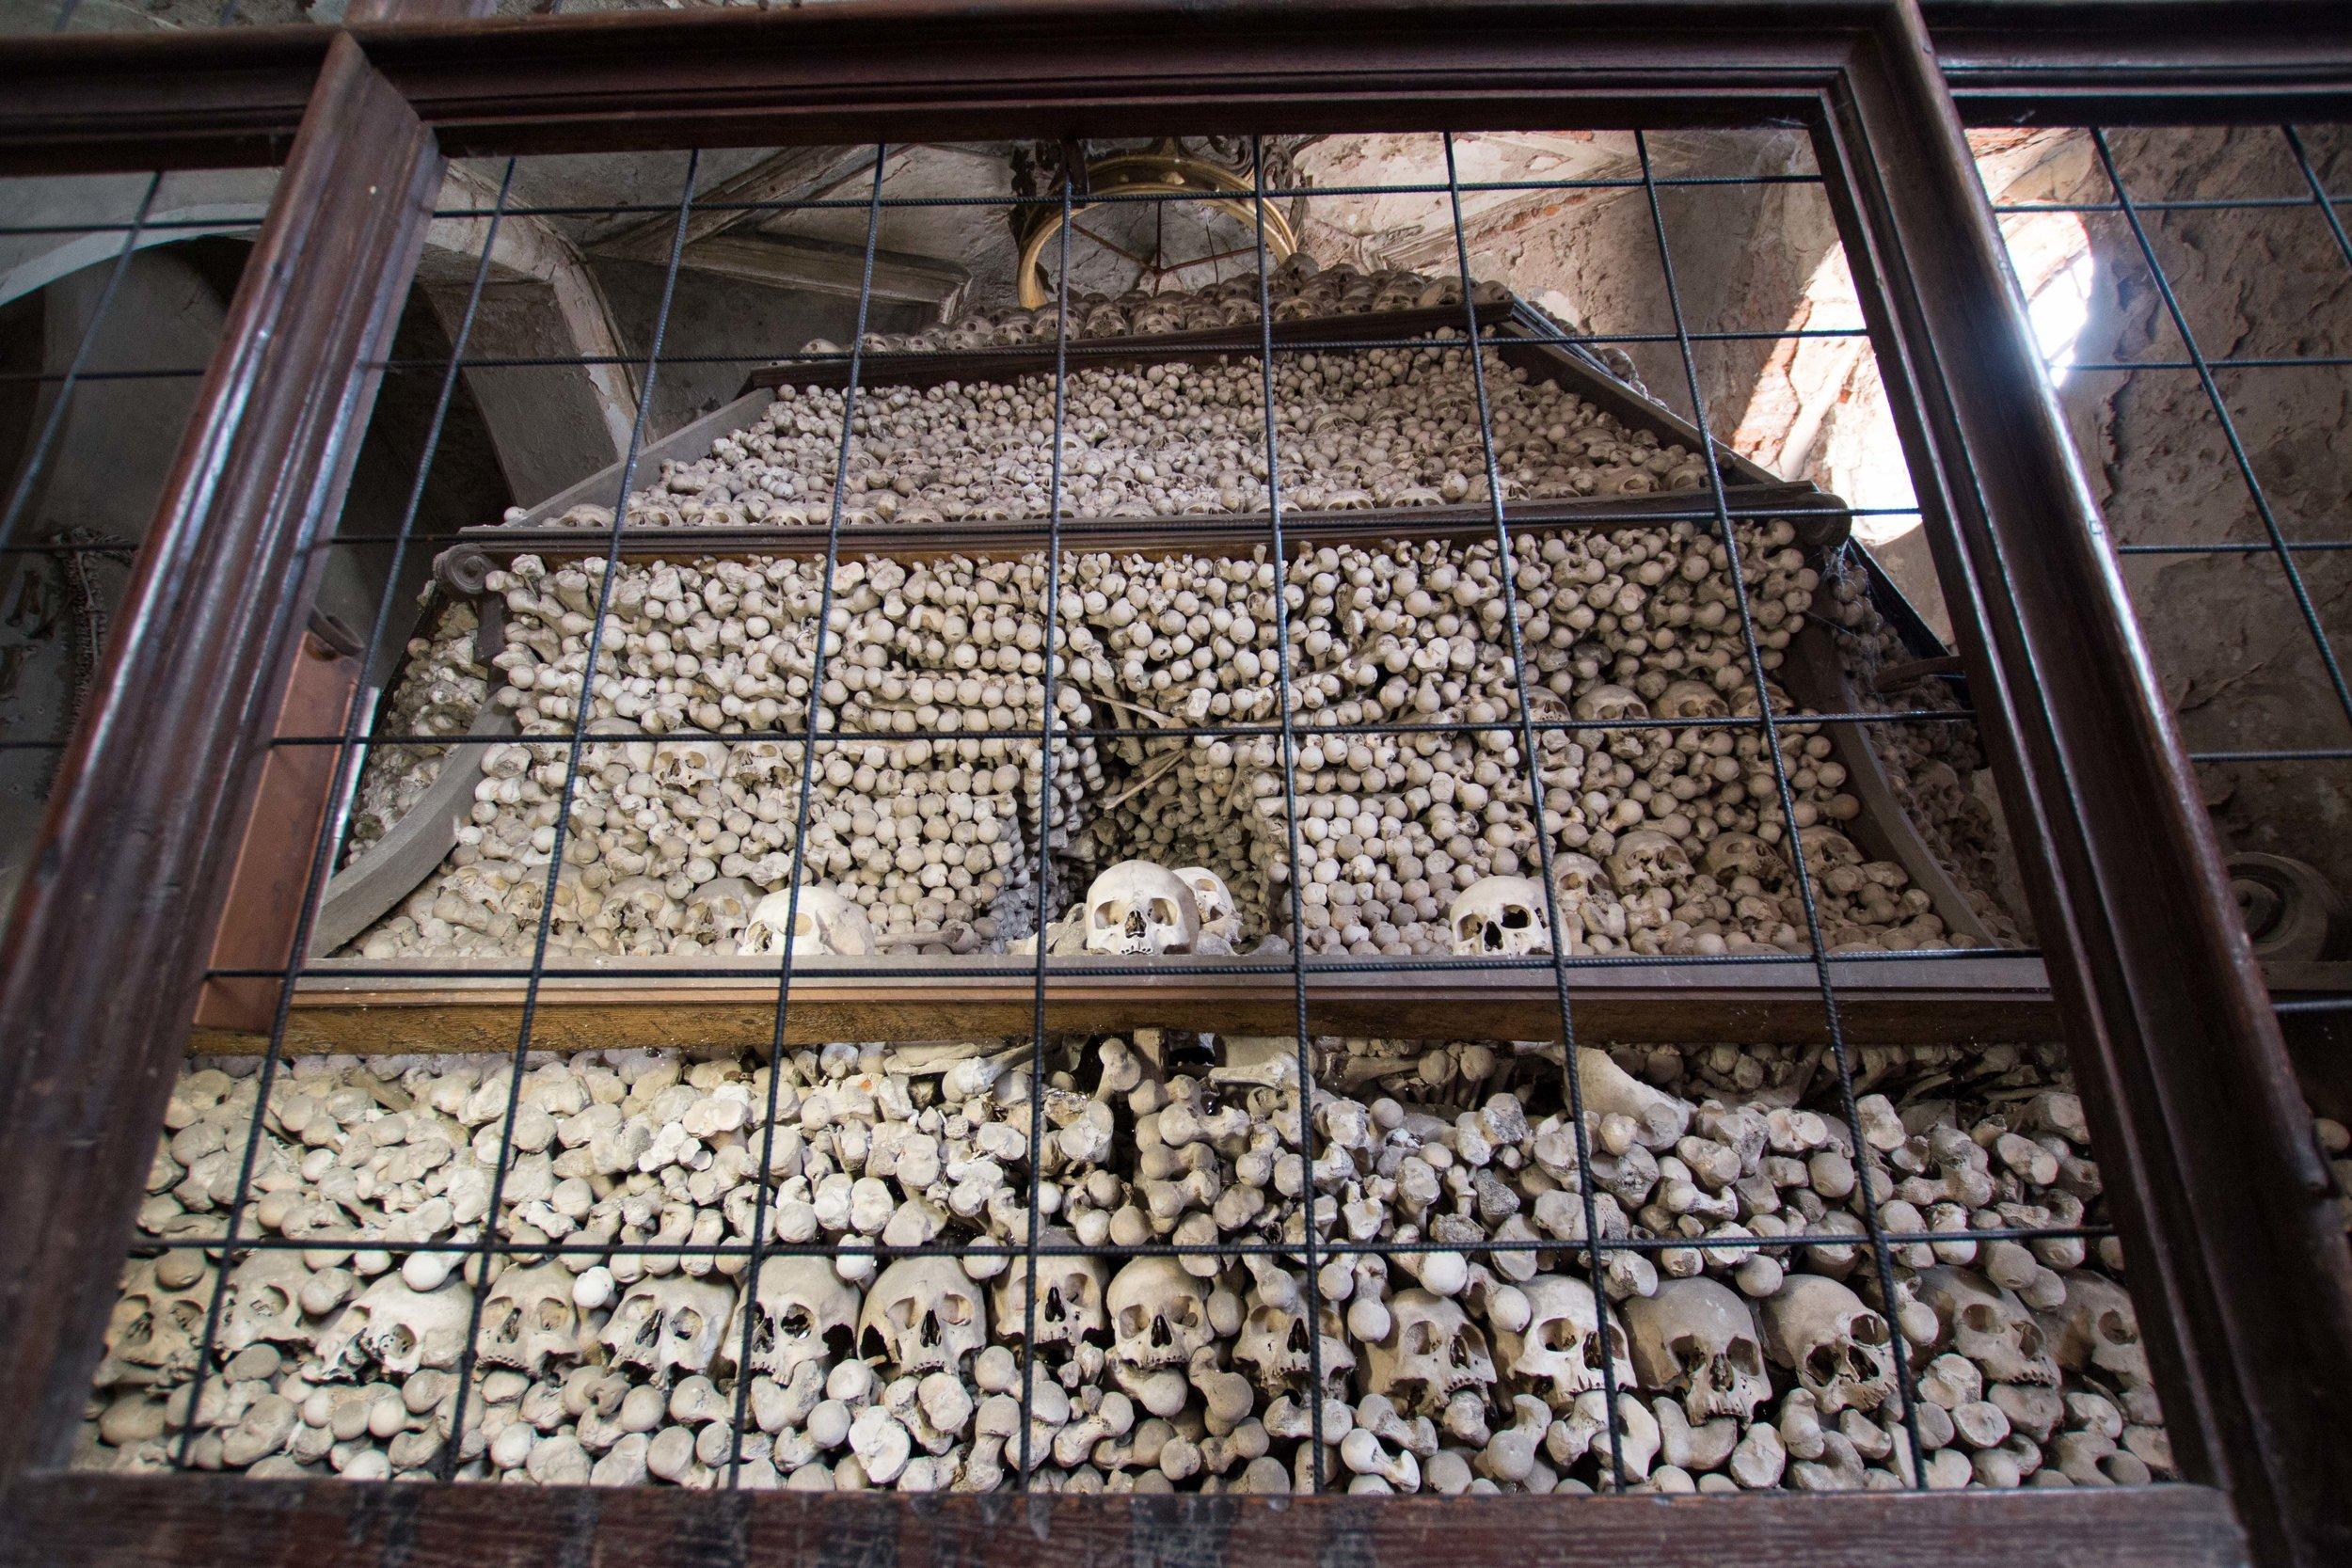 thousands of skulls, femurs, and long bones piled high